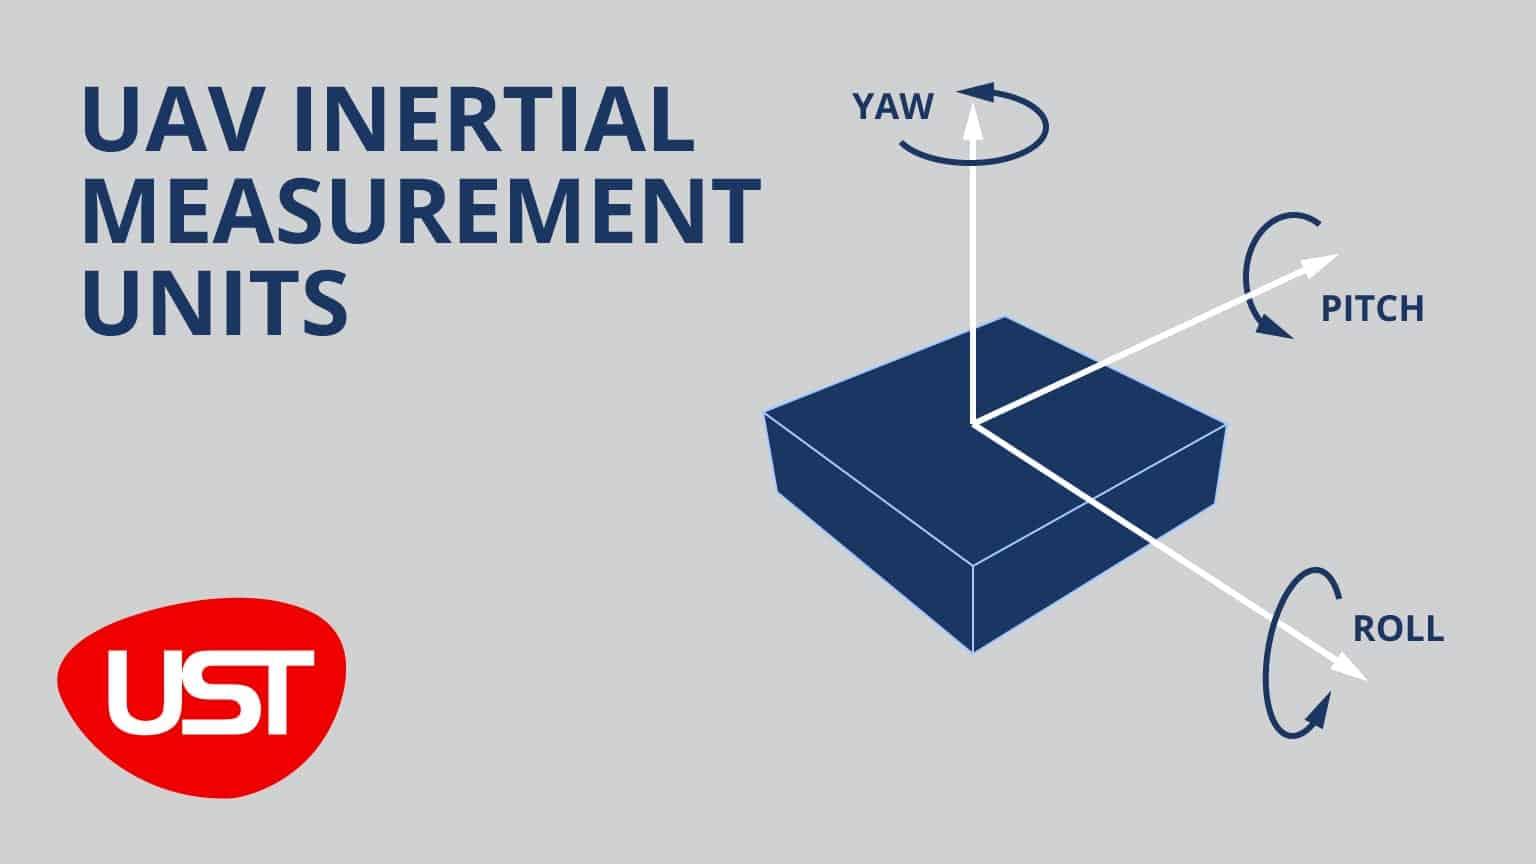 IMUs for UAVs